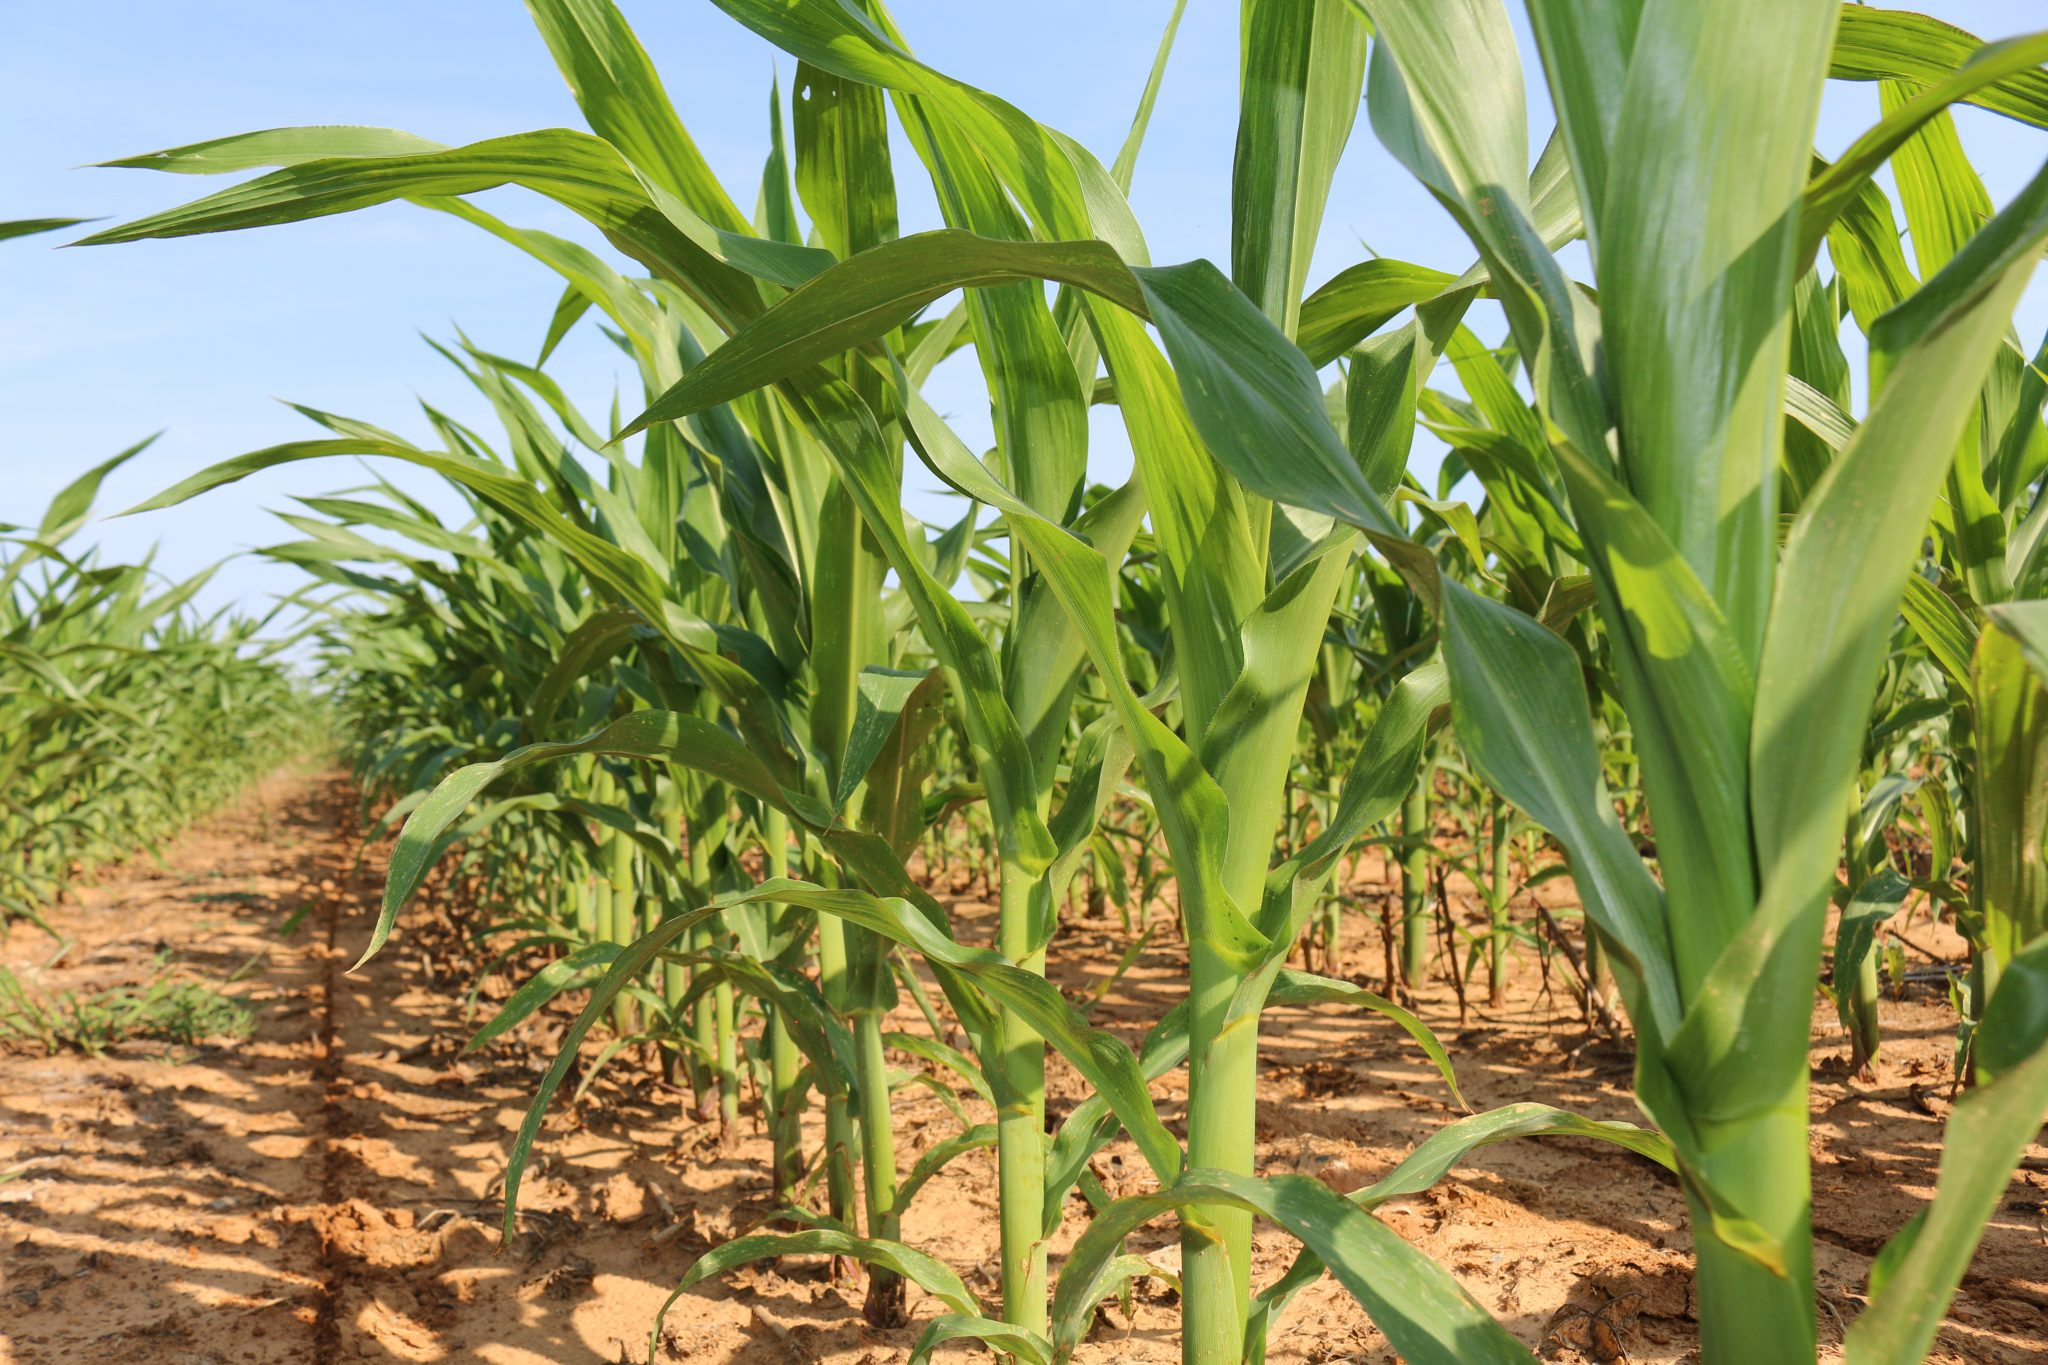 corn plants, market facilitation program